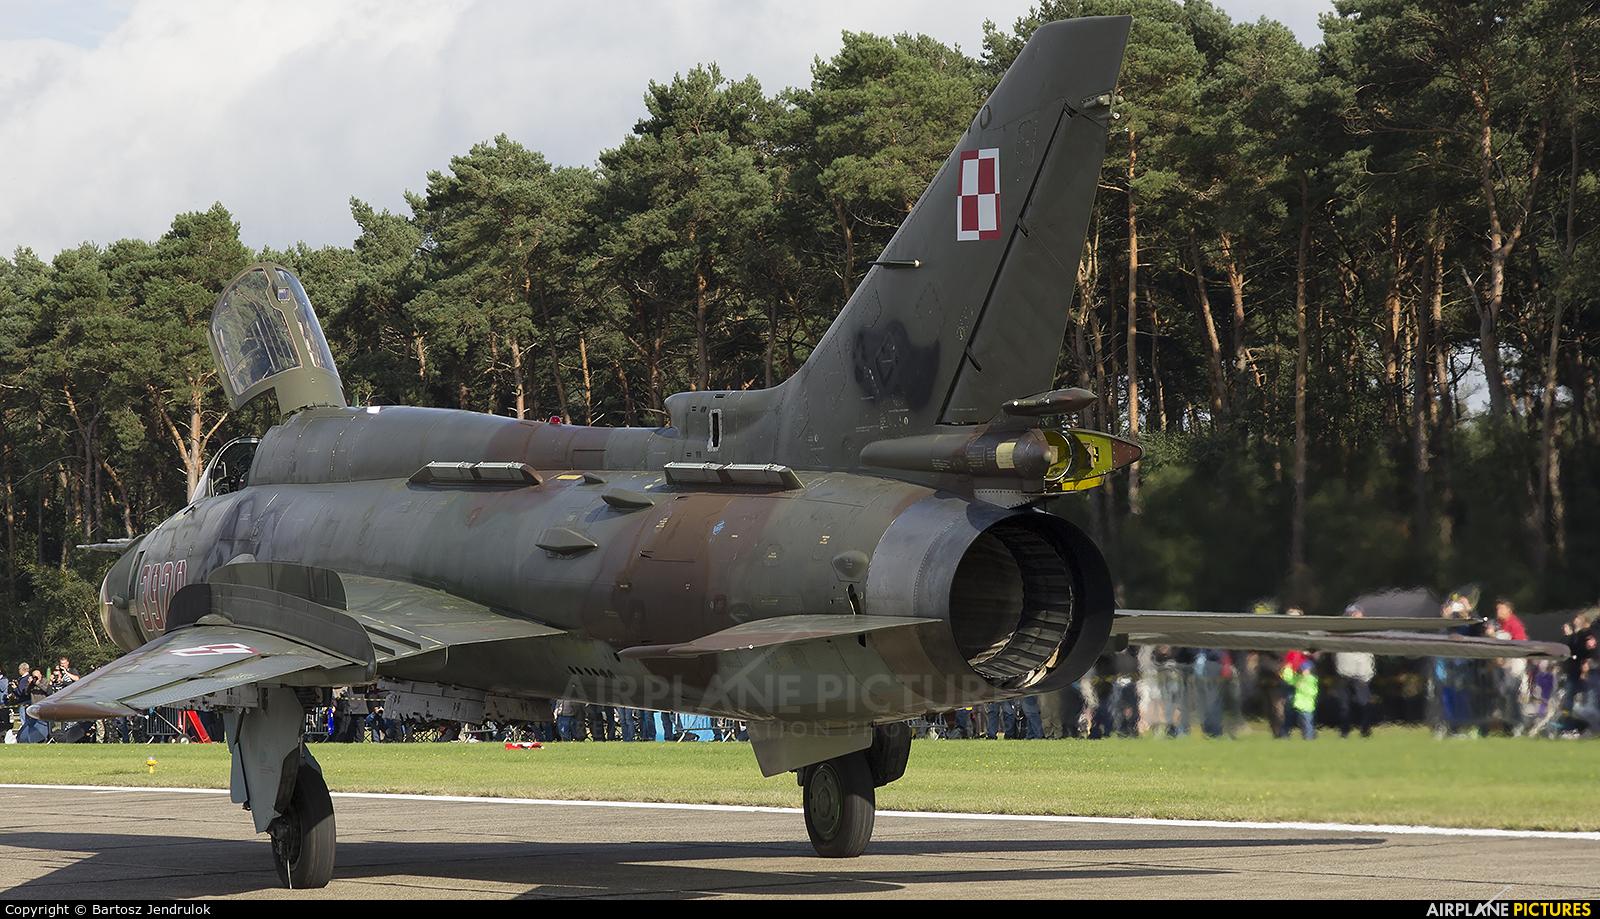 Poland - Air Force 3920 aircraft at Kleine Brogel